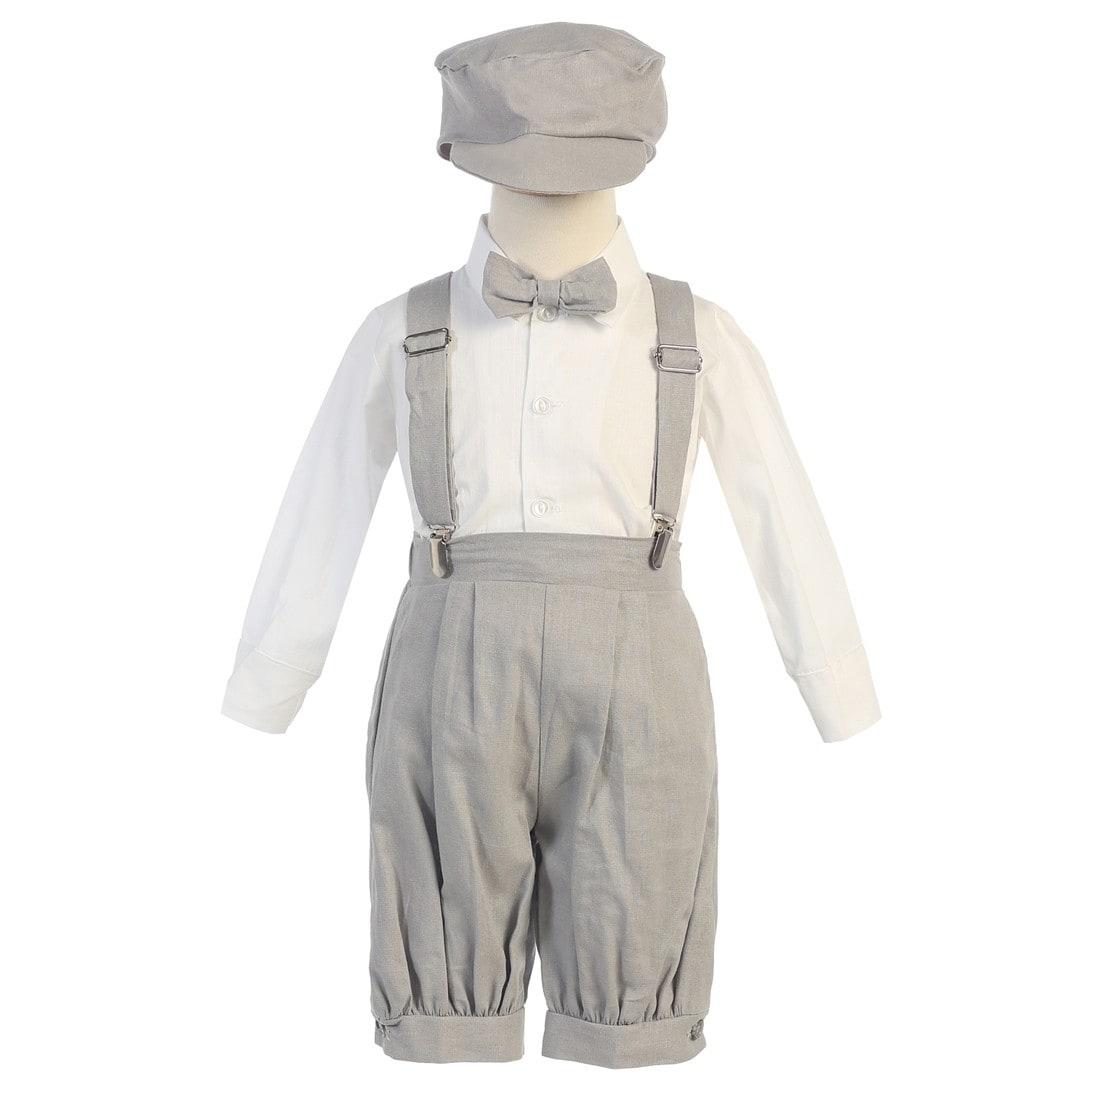 Lito Little Boys Charcoal Suspenders Short Pants Hat Easter Outfit Set 2-4T